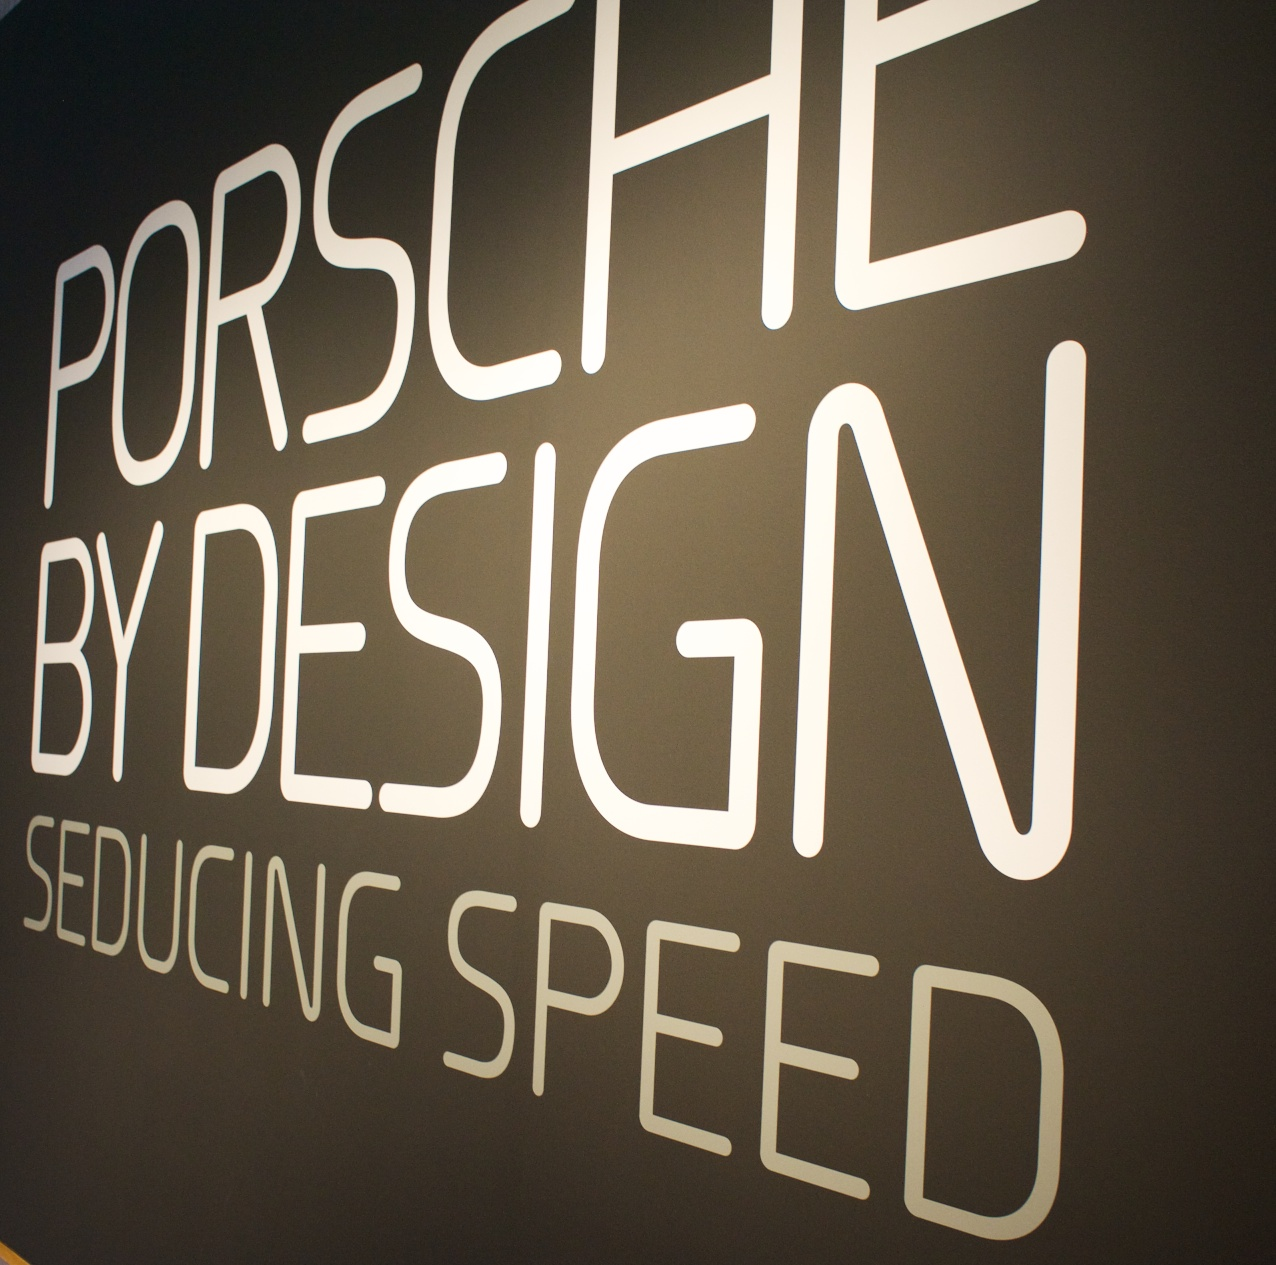 PorscheByDesign 47